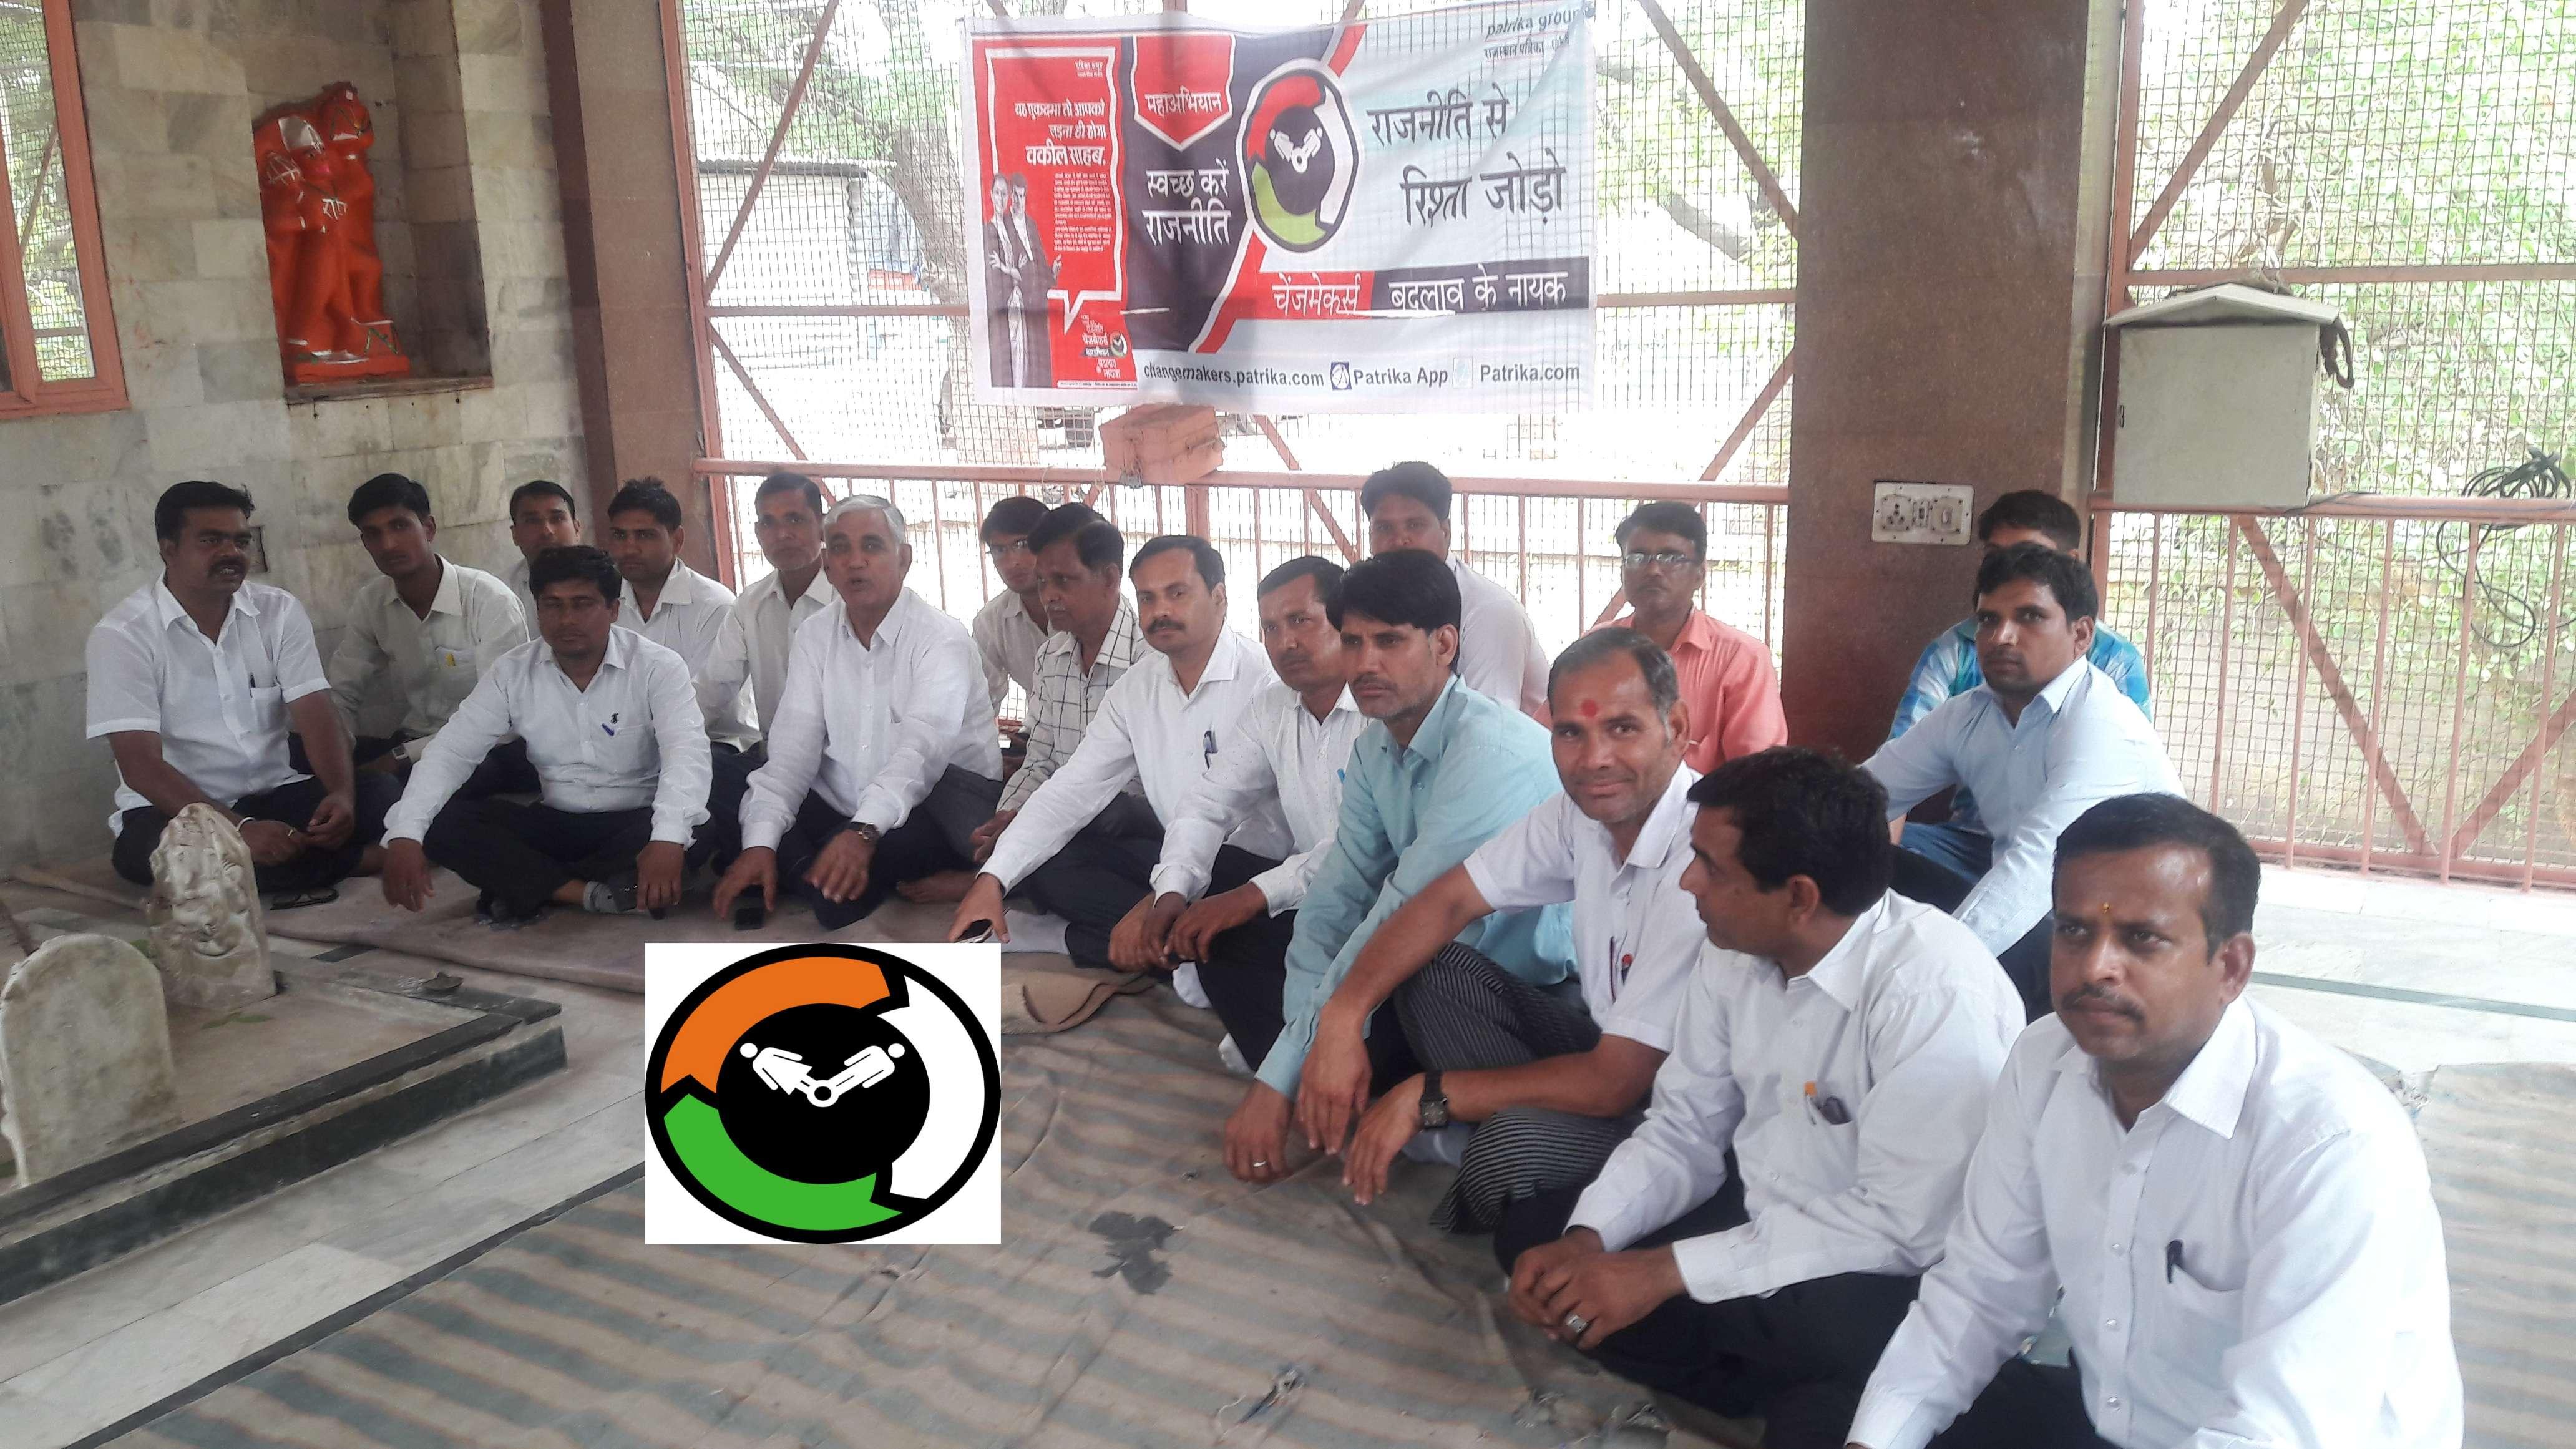 Changemaker campaign in jaipur